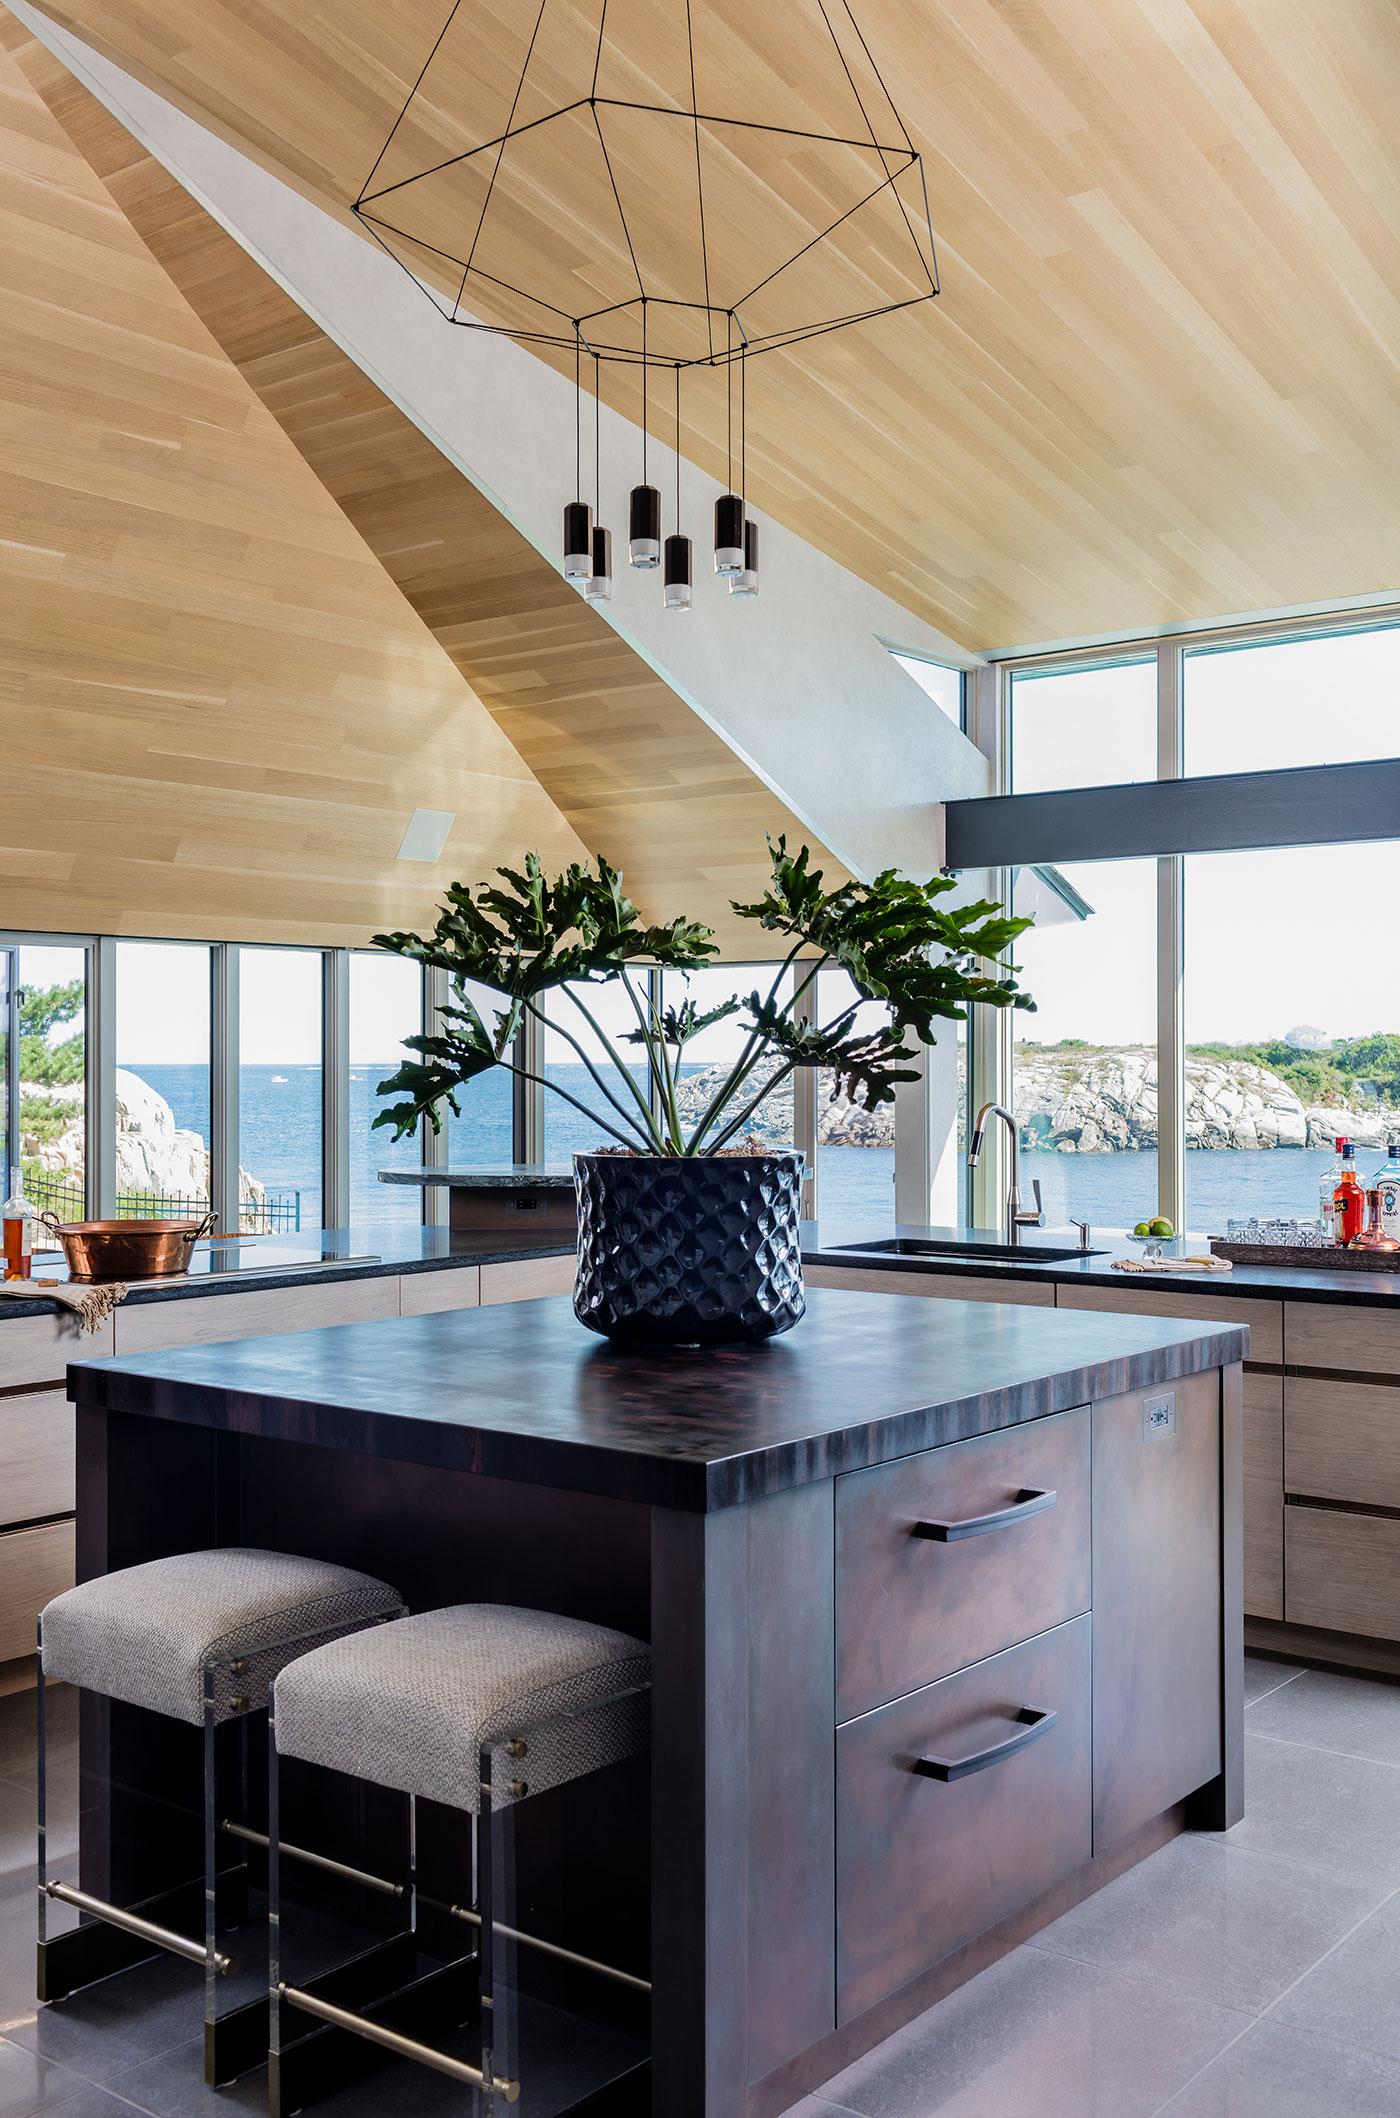 FIVE PROS ROCK COASTAL KITCHEN DESIGNS, Boston Design Guide ...